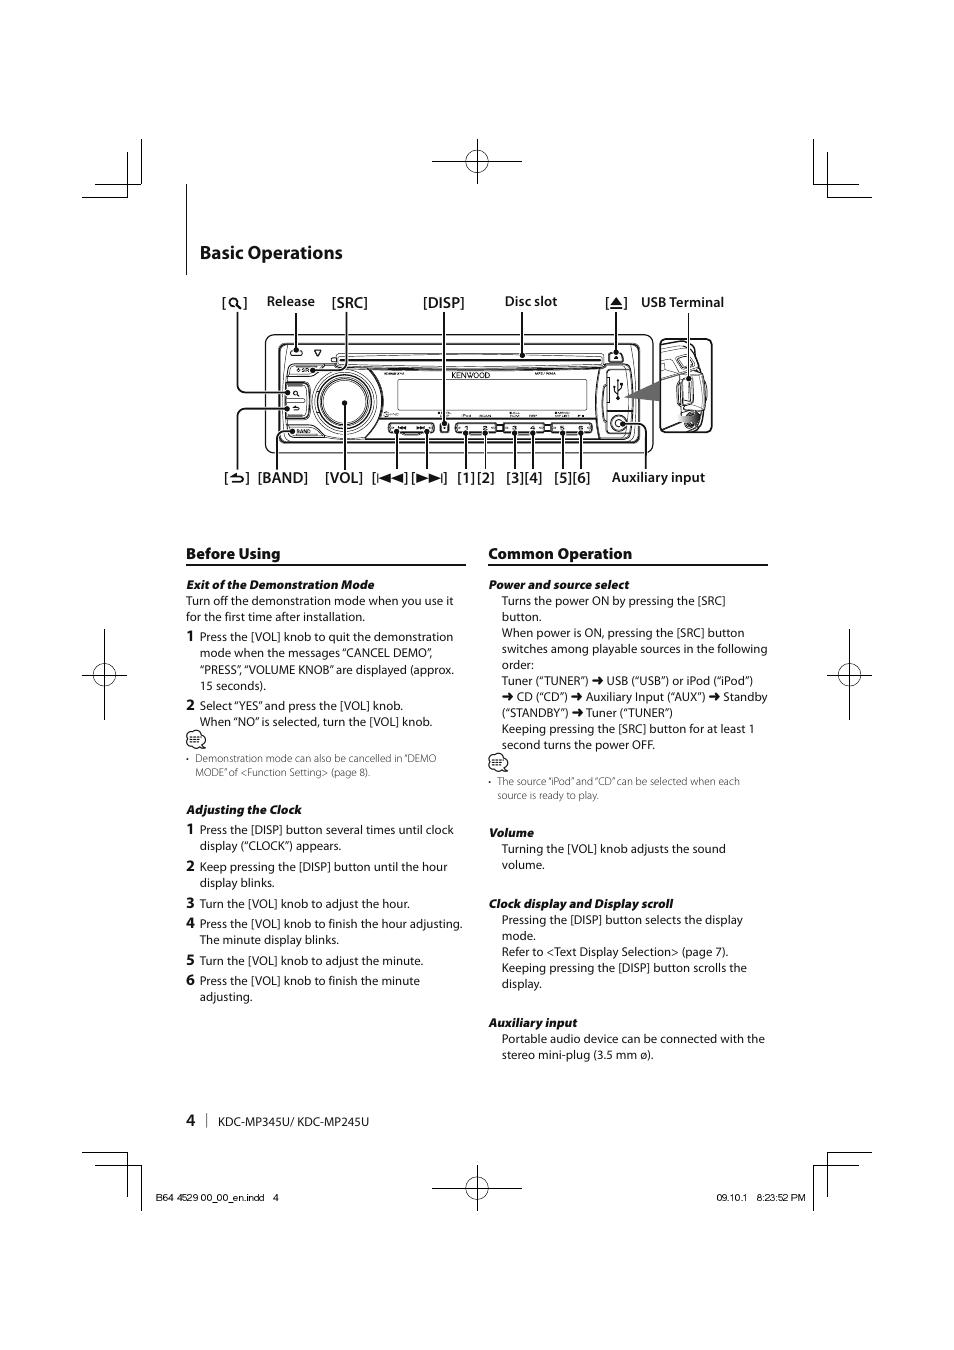 kdc mp345u Array - basic operations kenwood kdc mp345u user manual page 4  68 rh manualsdir ...